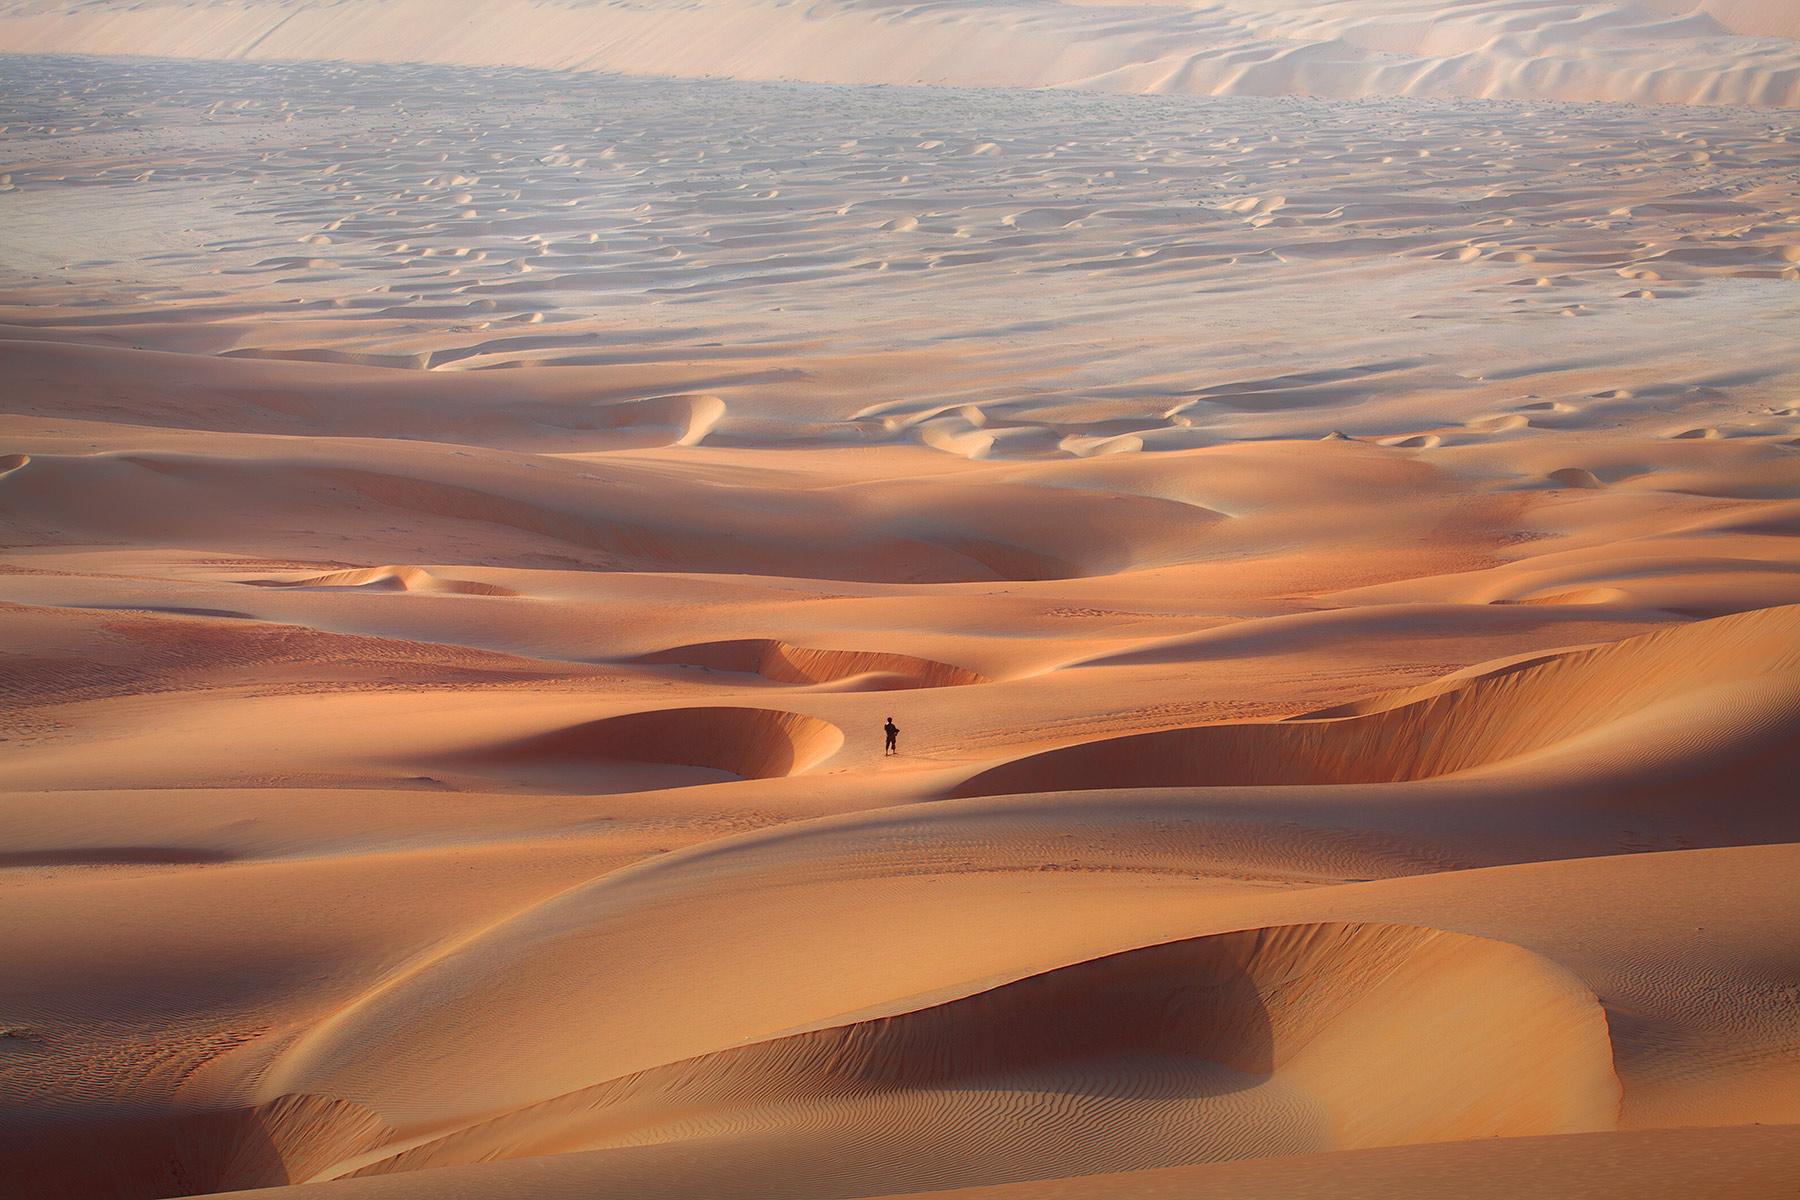 Fellow photographer Abdullaziz Bin Ali roams the dunes in the Empty Quarter, United Arab Emirates.